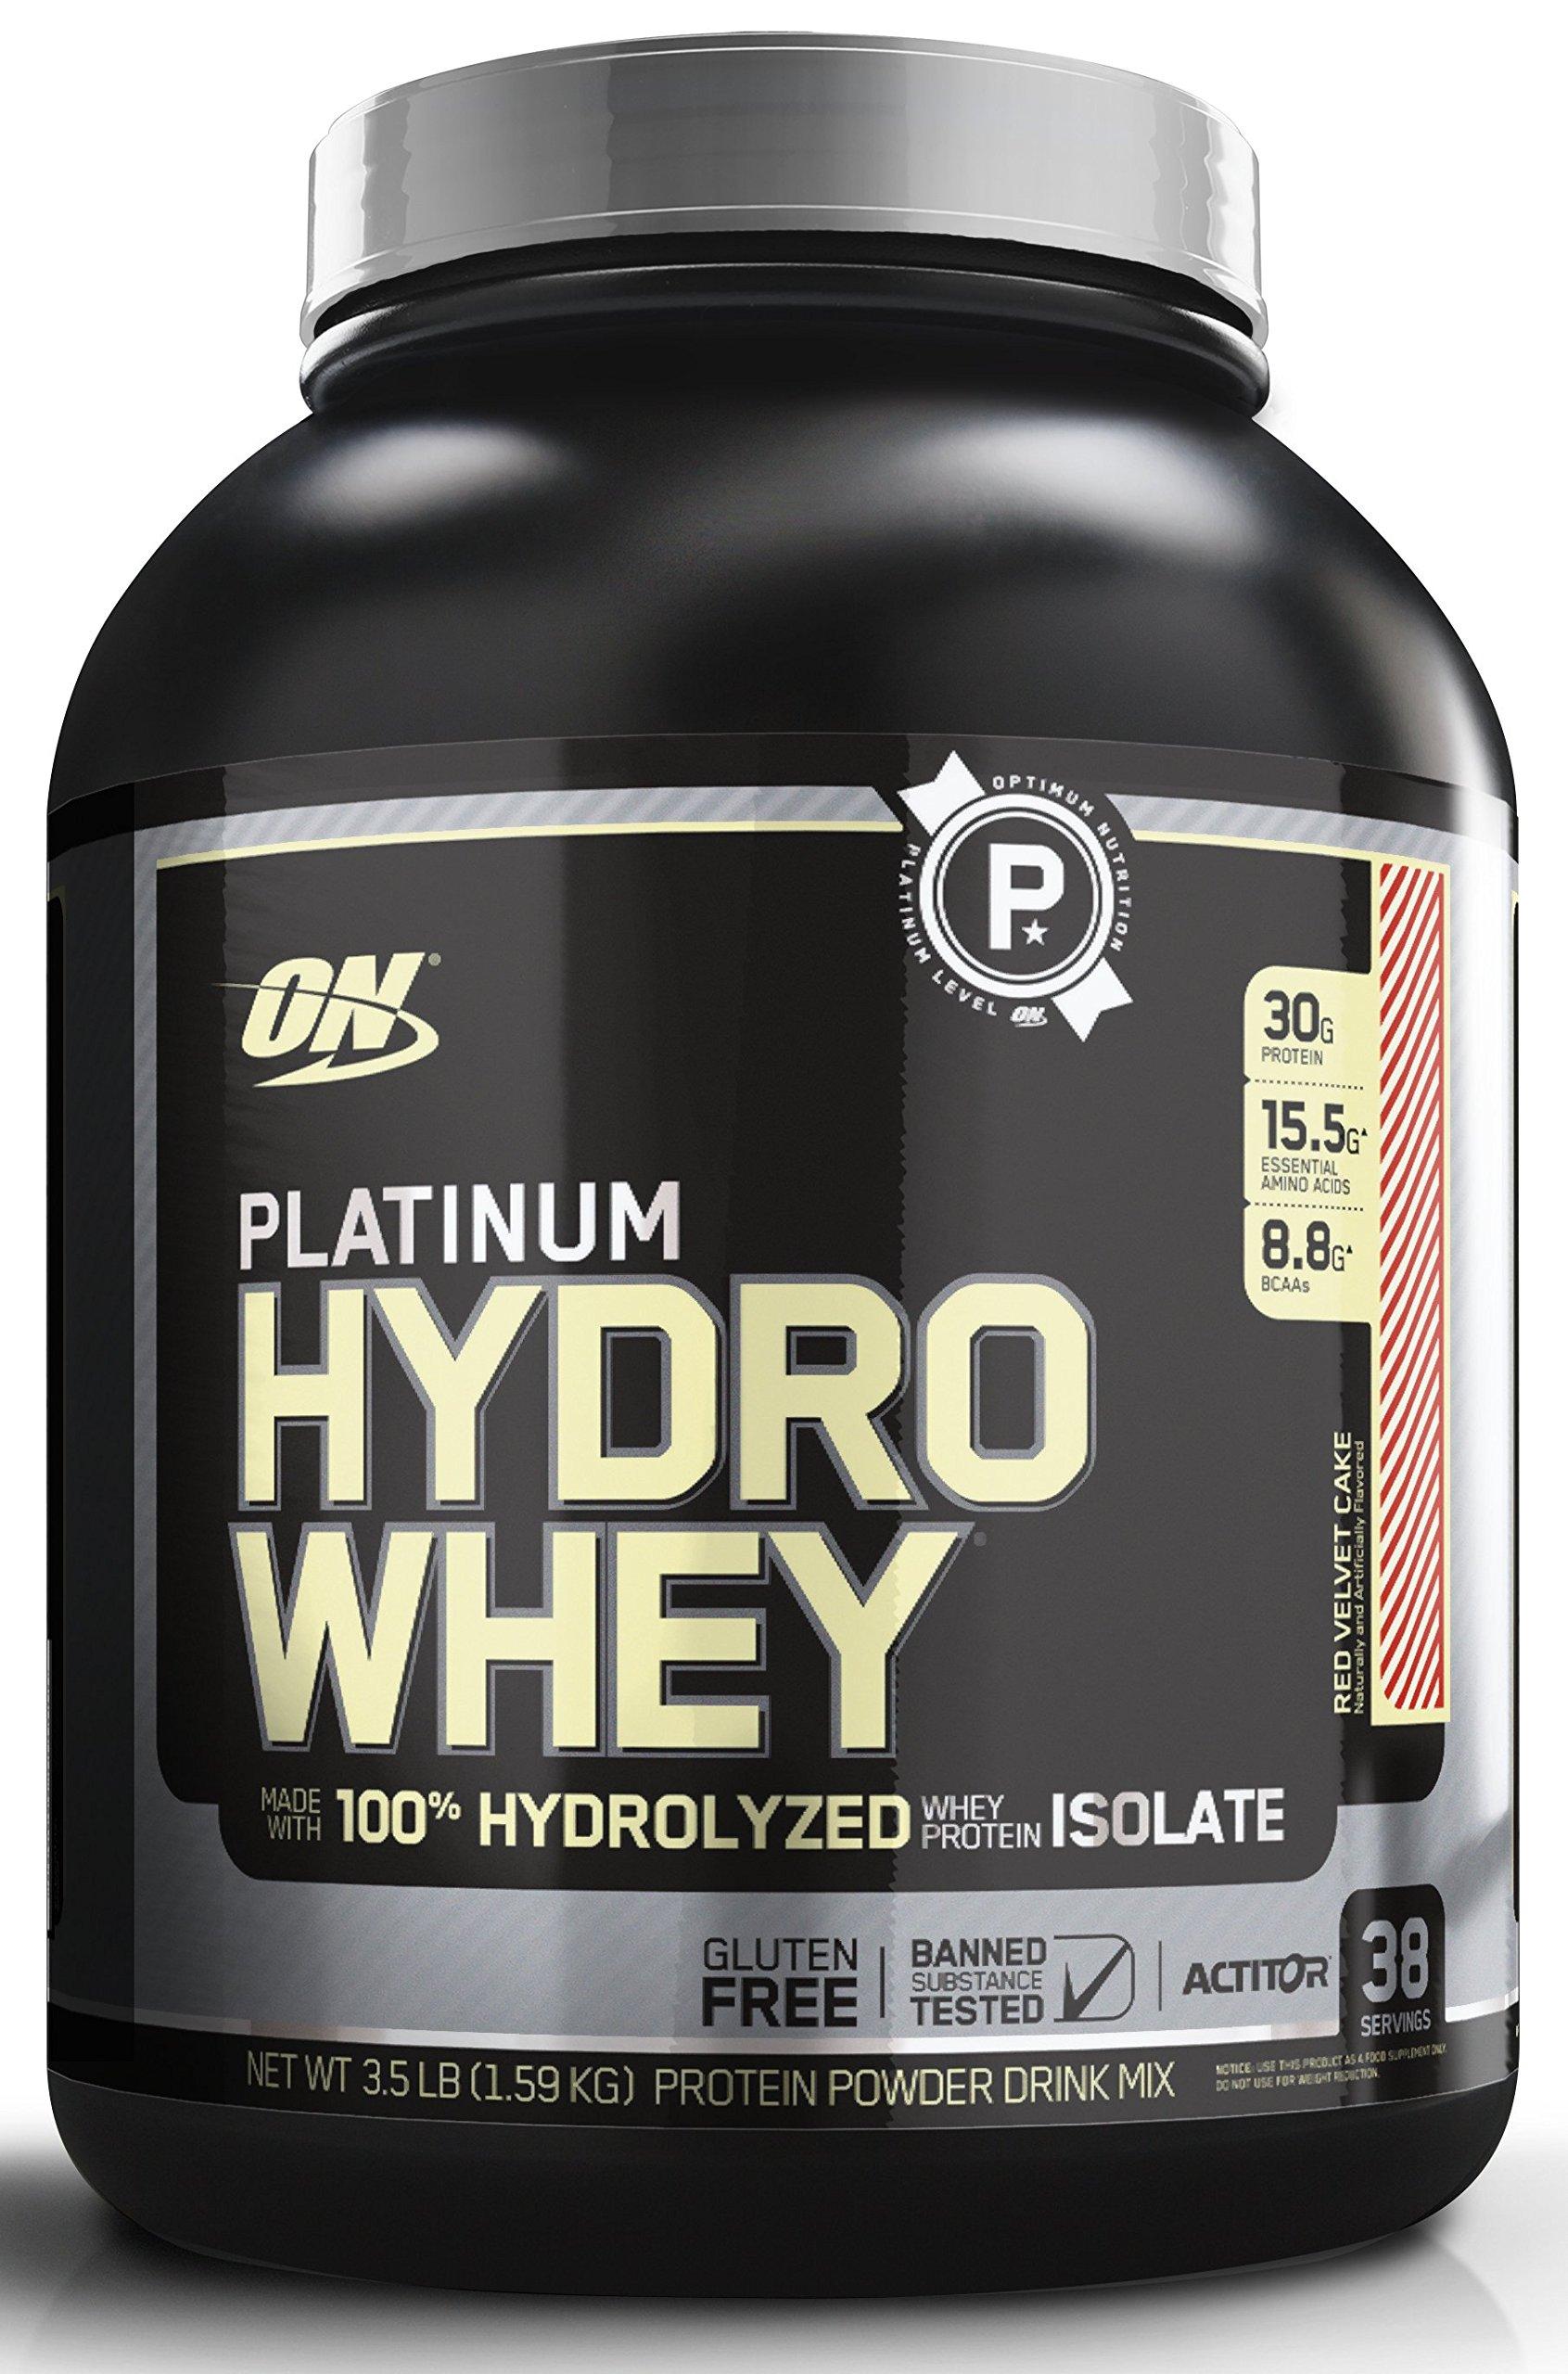 Amazon.com: Optimum Nutrition Platinum Hydro Builder, Chocolate Shake, 20 Servings: Health